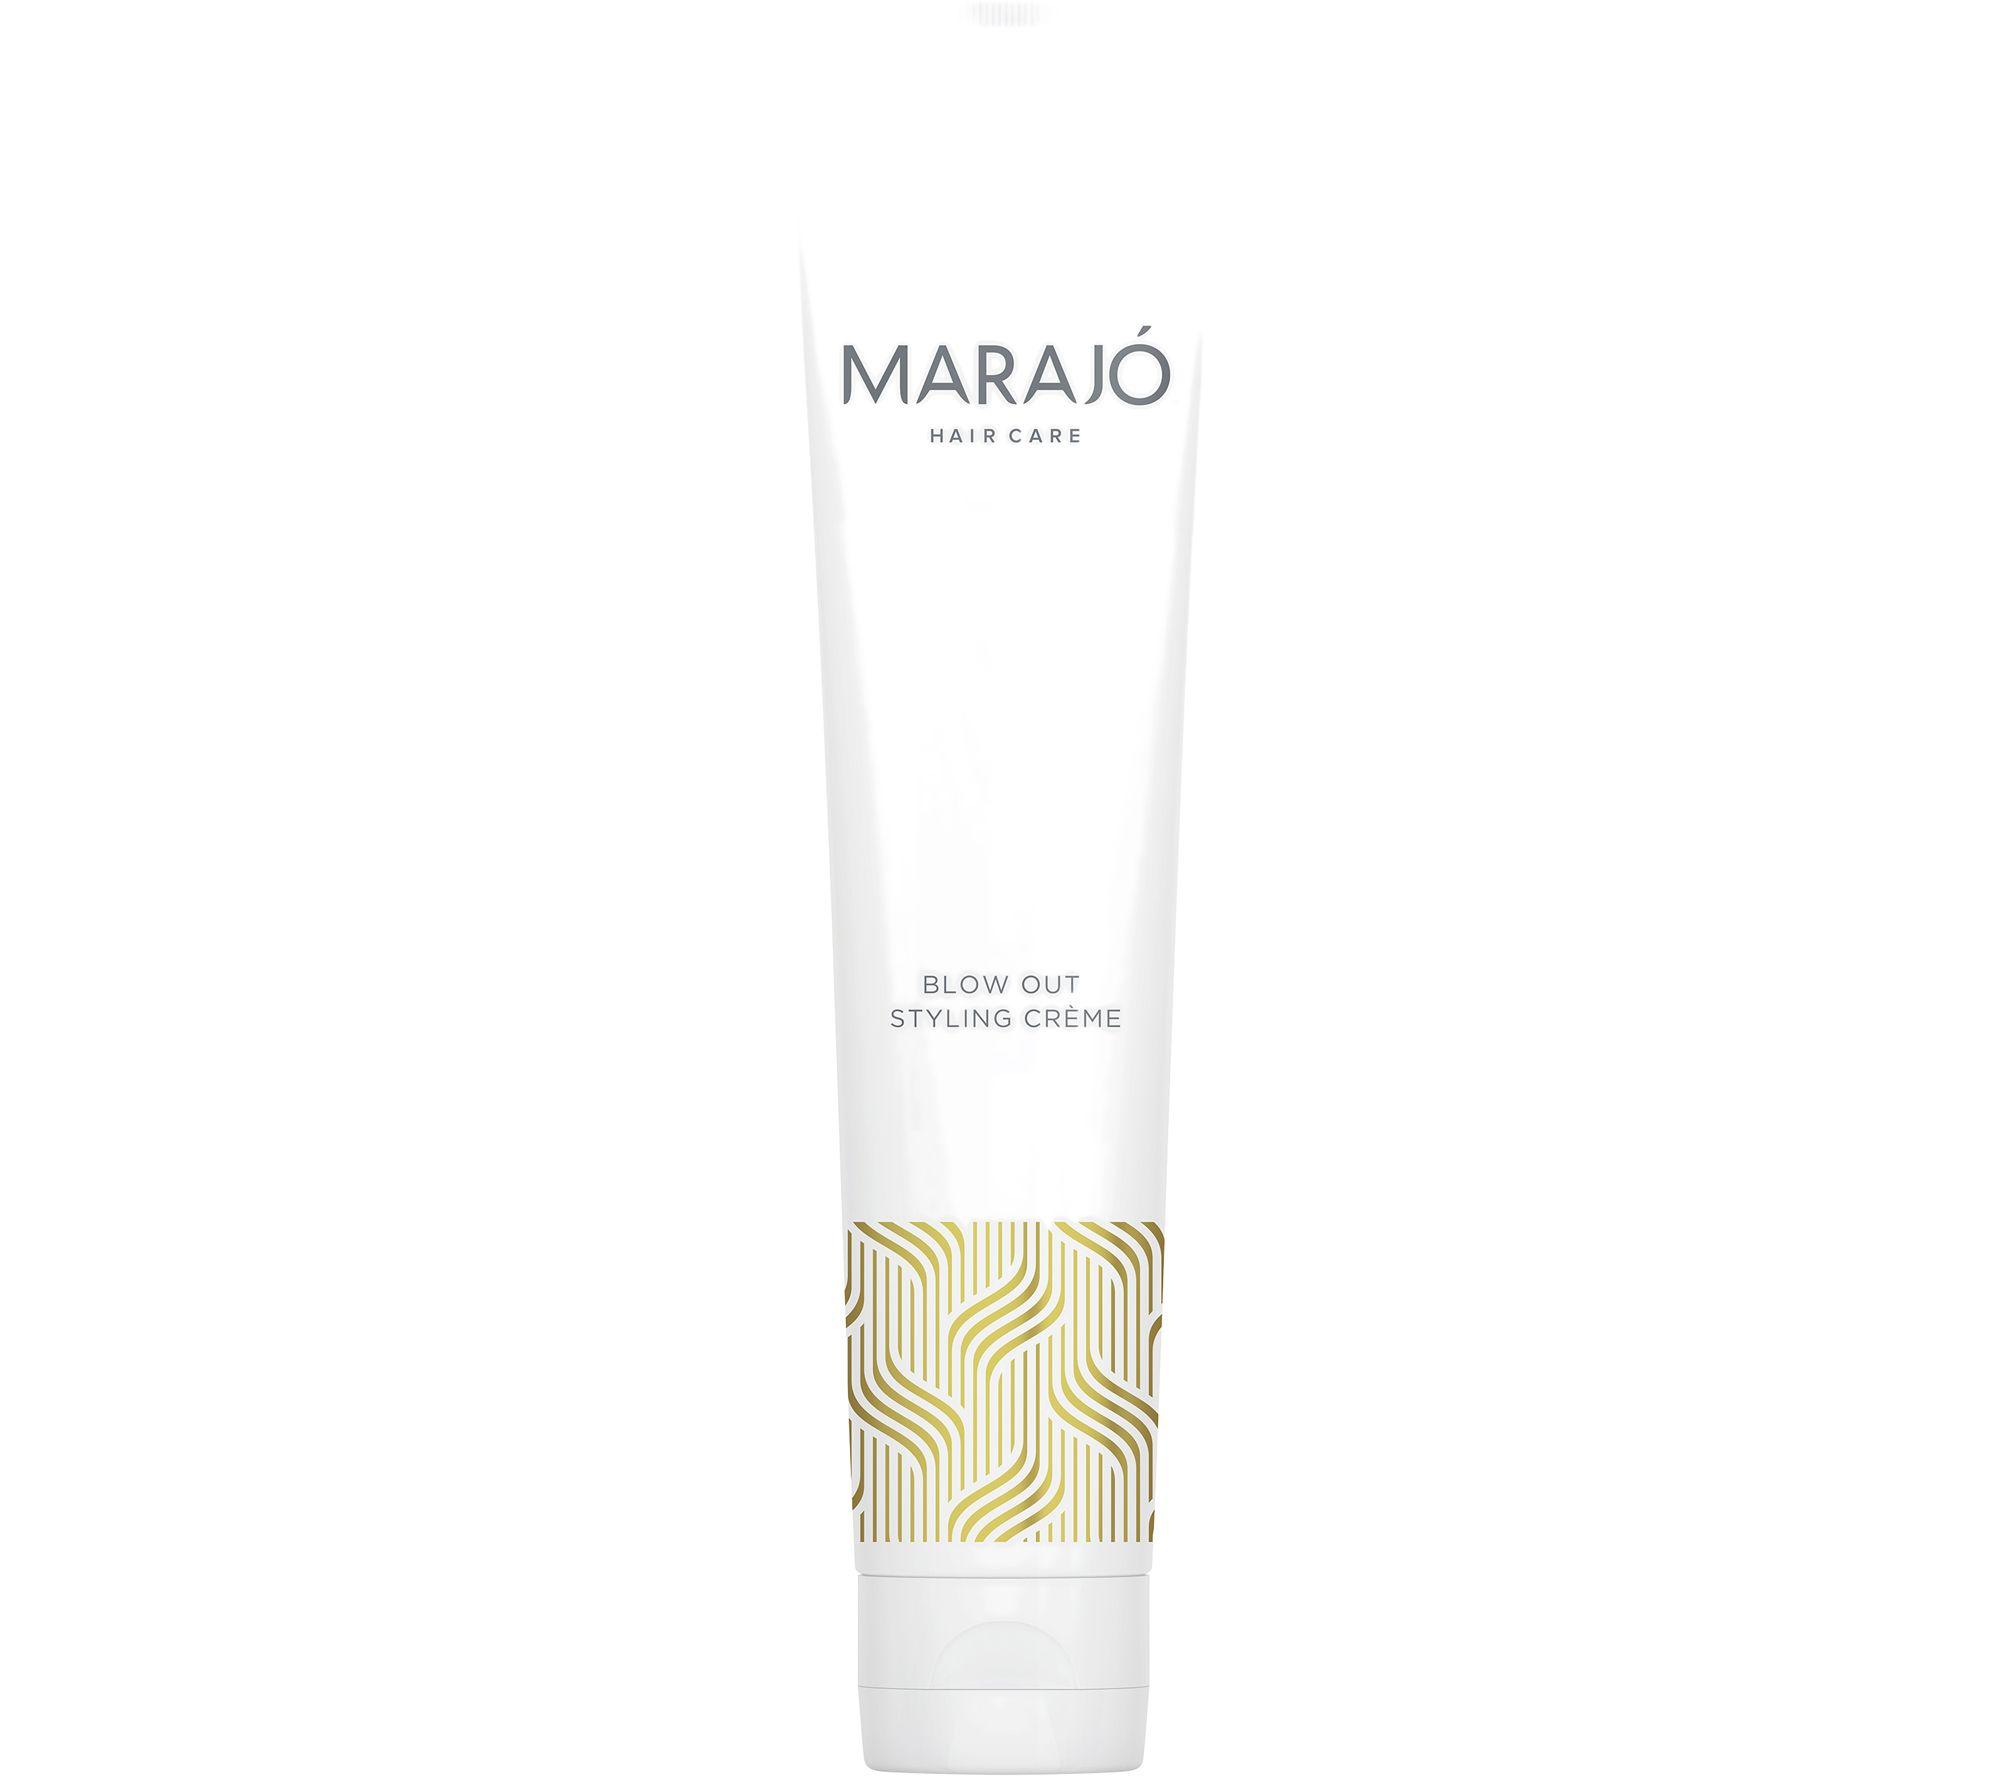 be5b0dda202 Marajo Blow Out Styling Creme, 6 fl oz — QVC.com